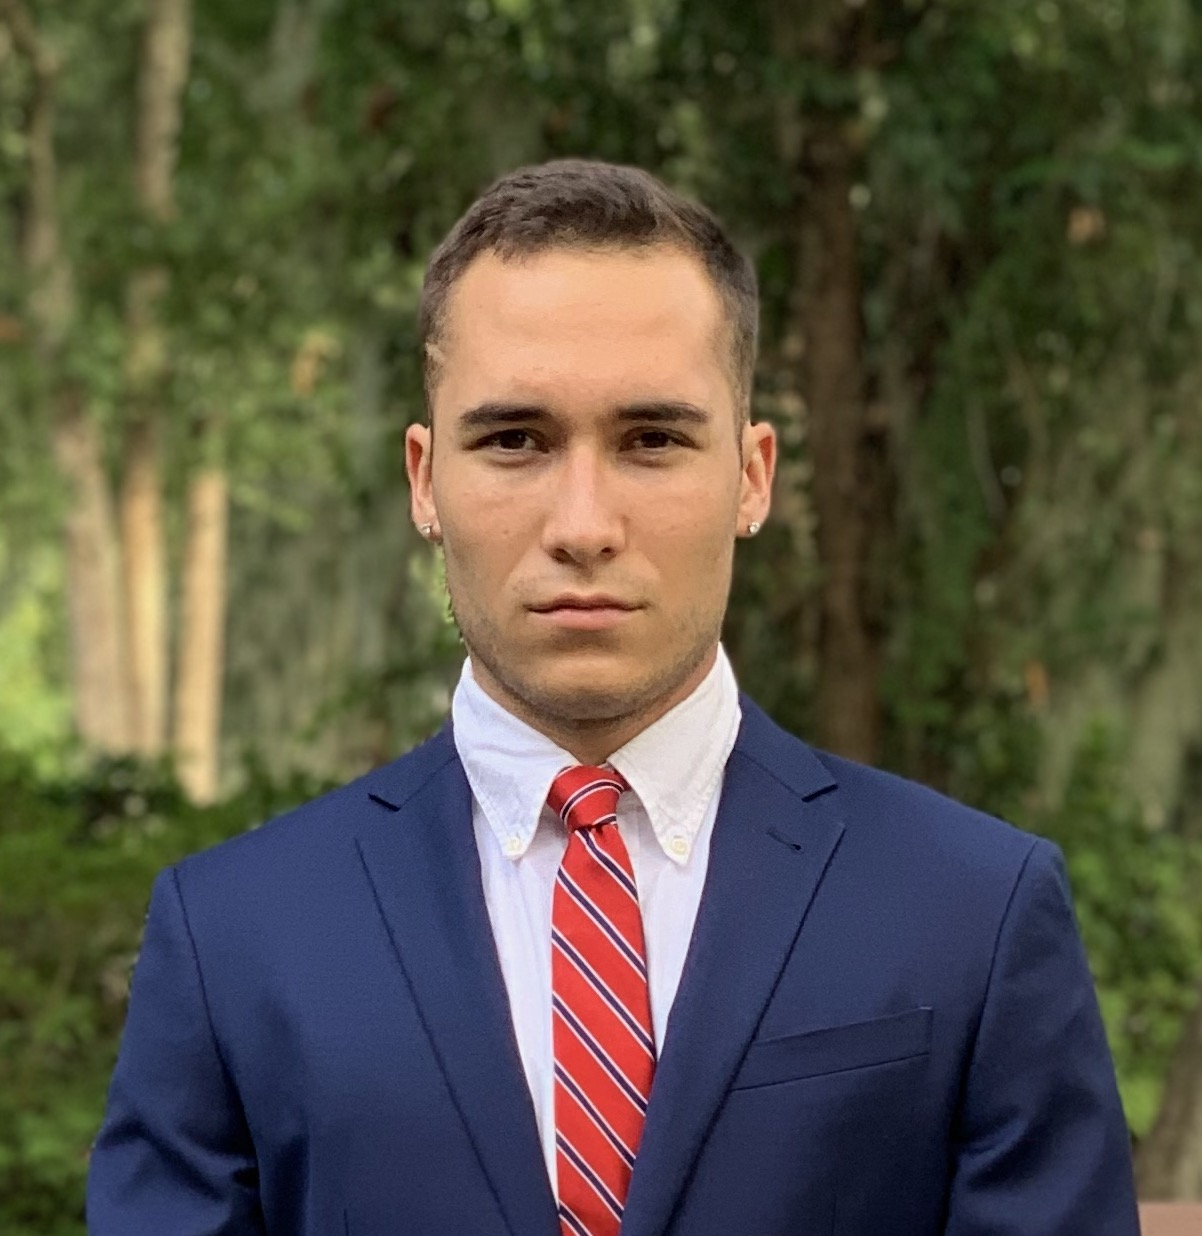 William Rittmeyer : Master student (2019 - current)